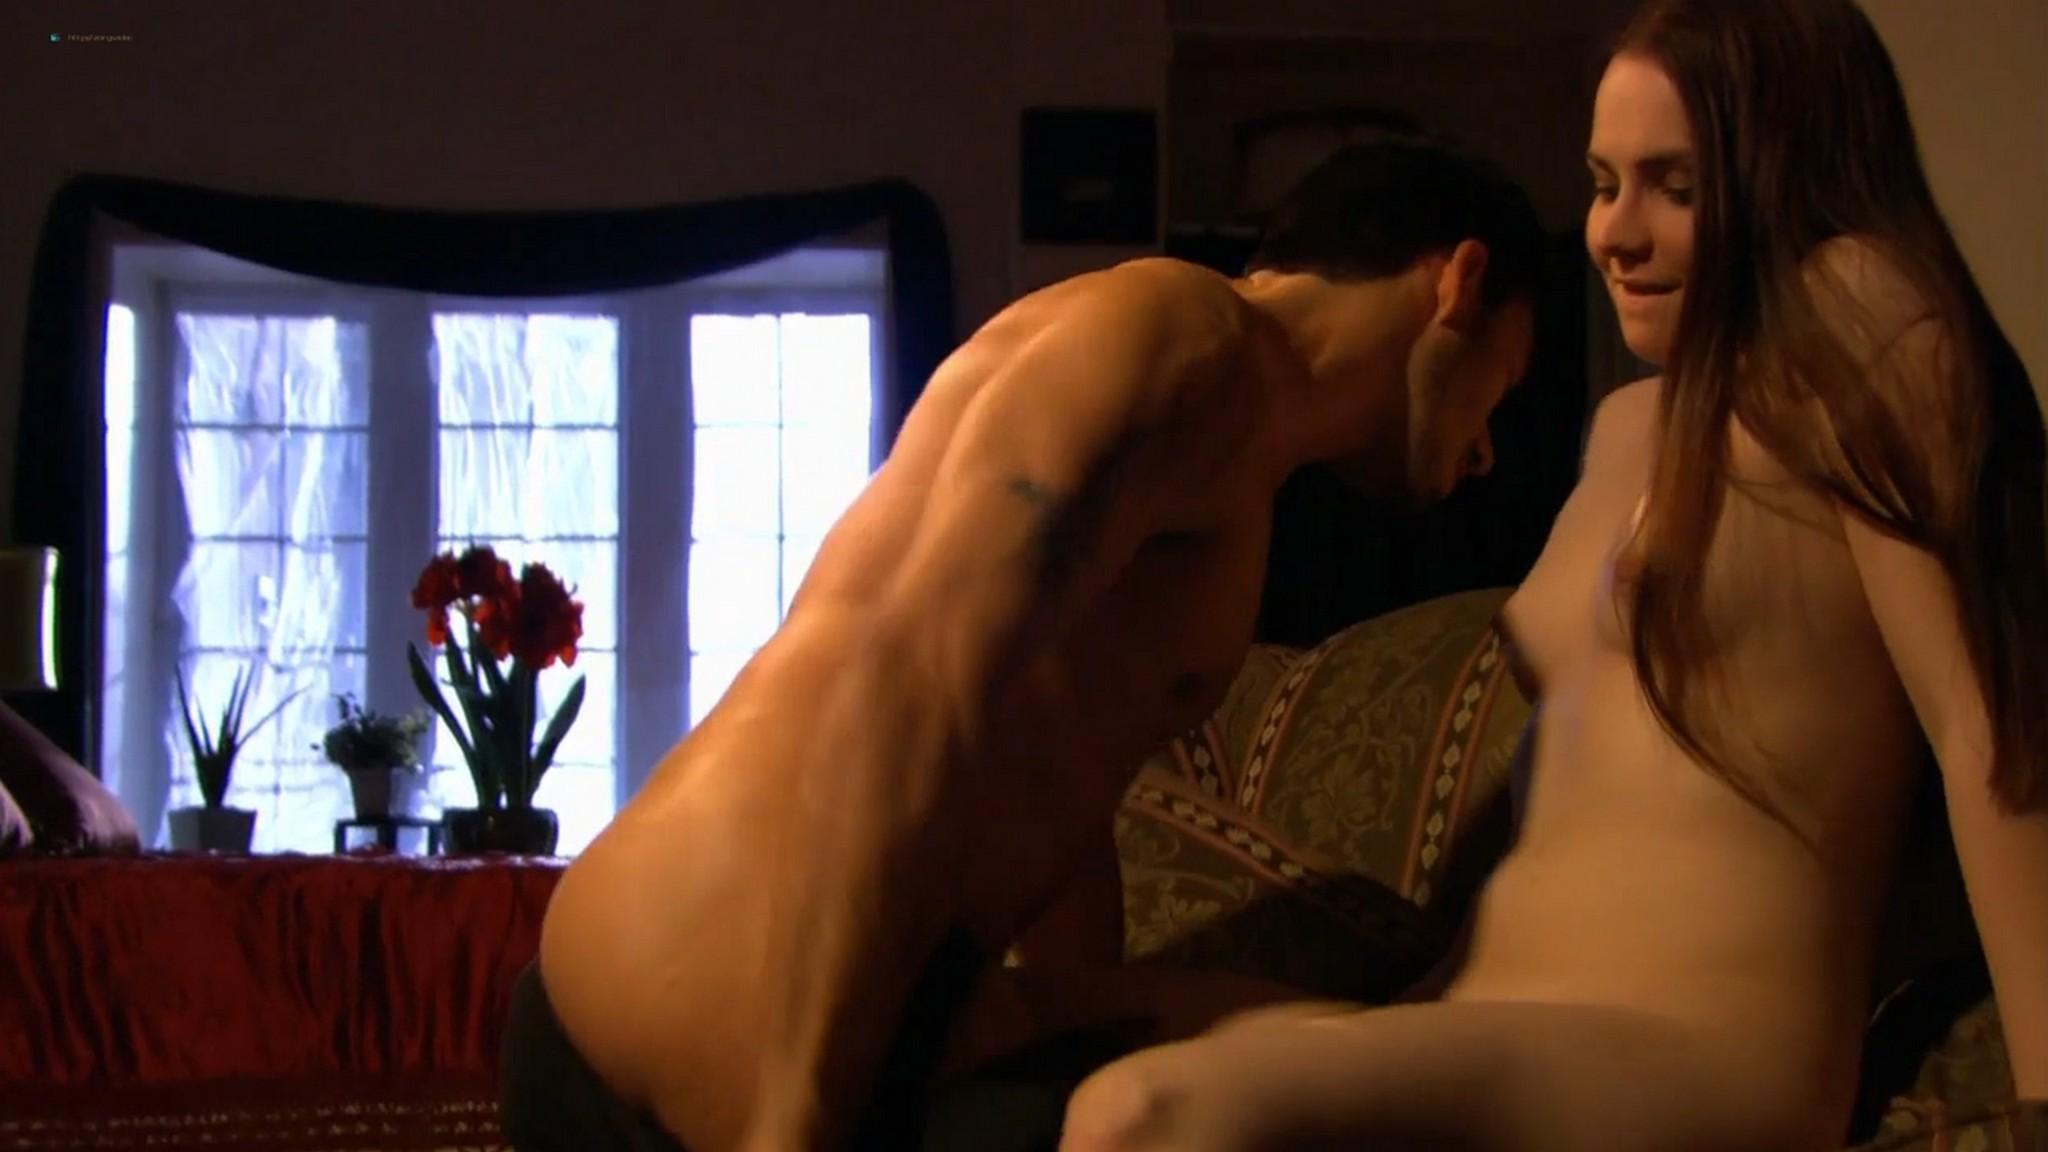 Lana Tailor nude lesbian sex Denise Cobar Erin Brown nude lot of sex Lingerie 2009 s1e11 HD 720p 003